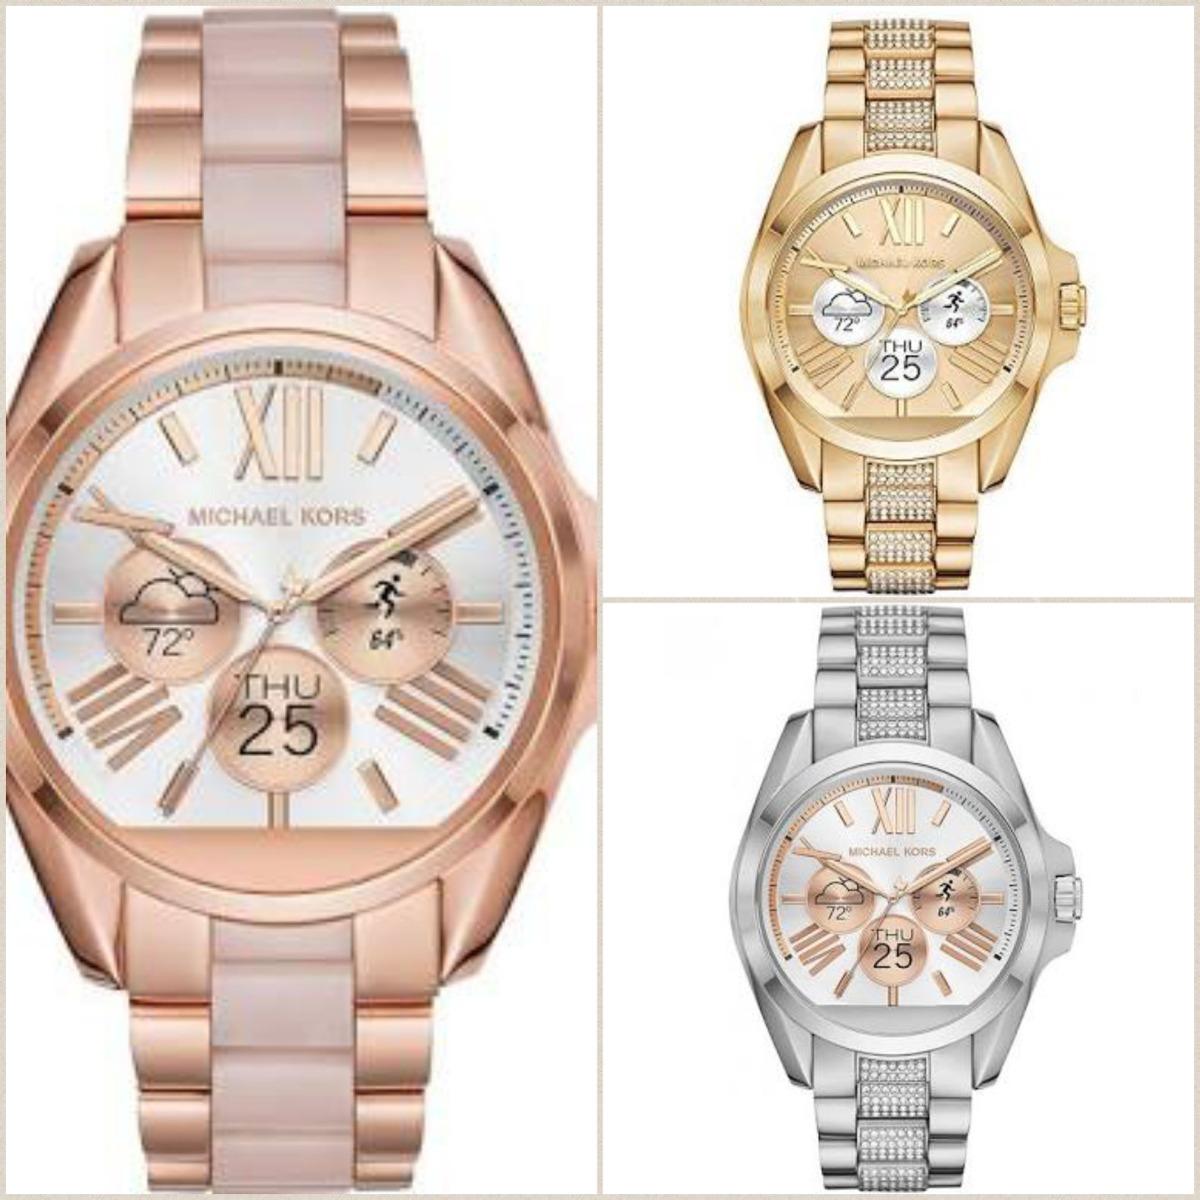 177d07c02263 reloj michael kors rosado  smartwatch mk rose gold mkt5013. Cargando zoom.